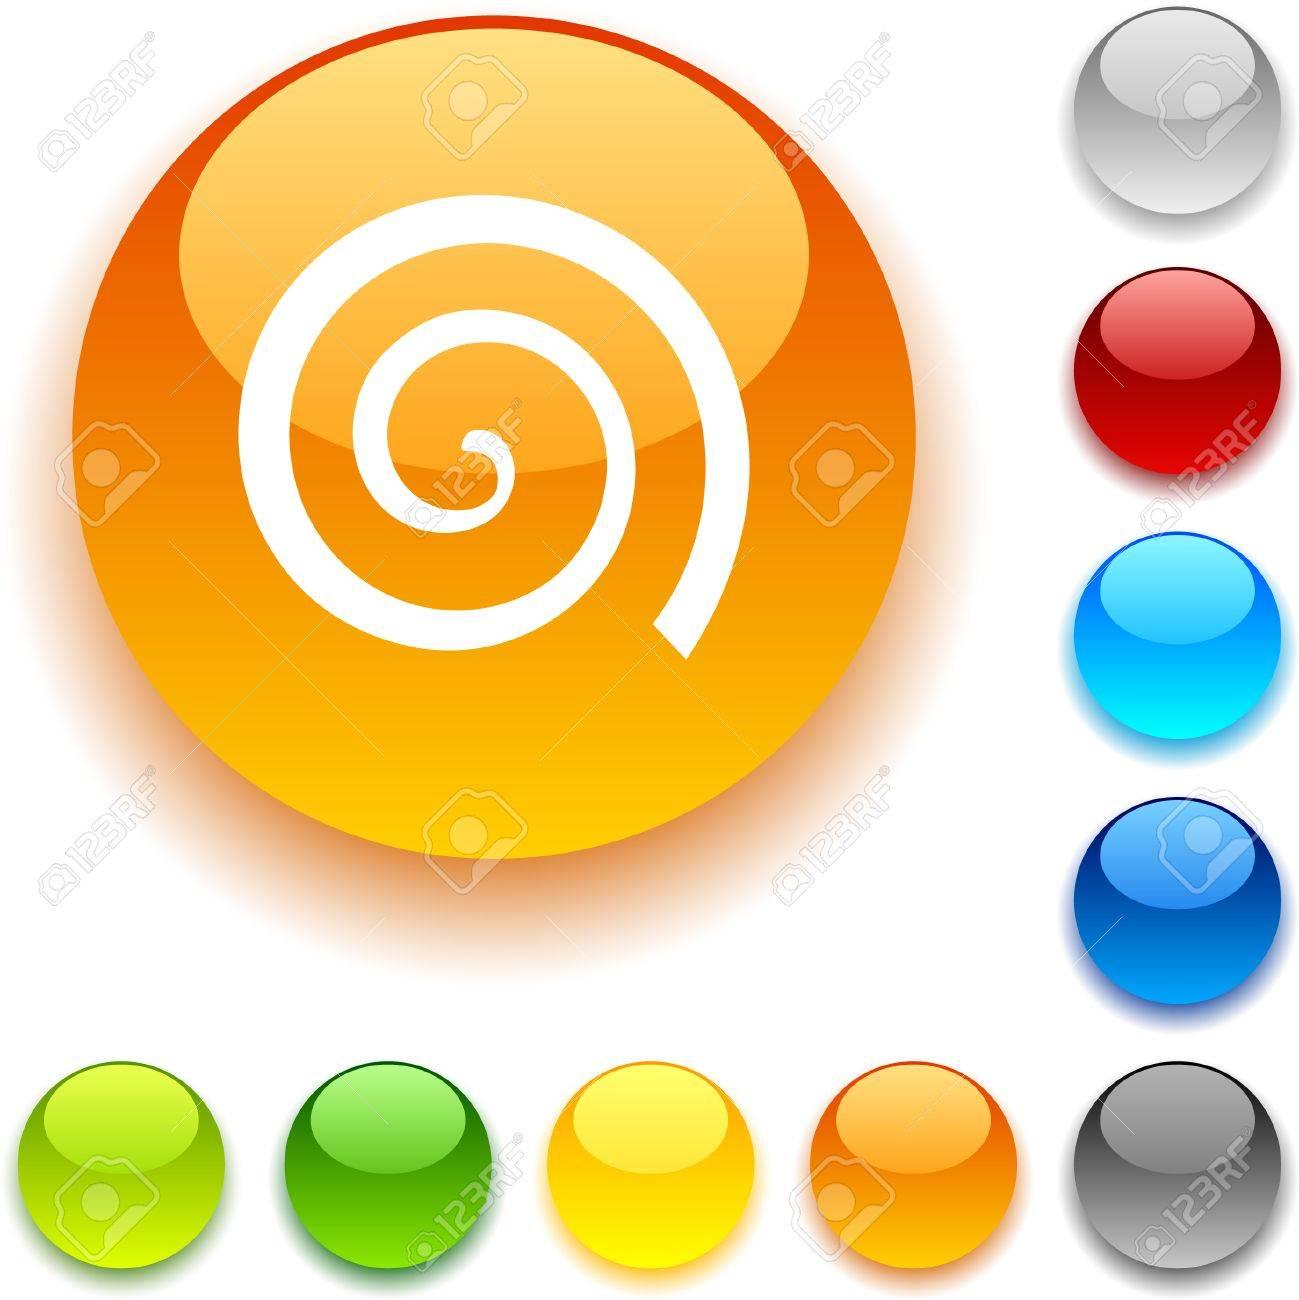 Swirl shiny button. Vector illustration. Stock Vector - 5457956